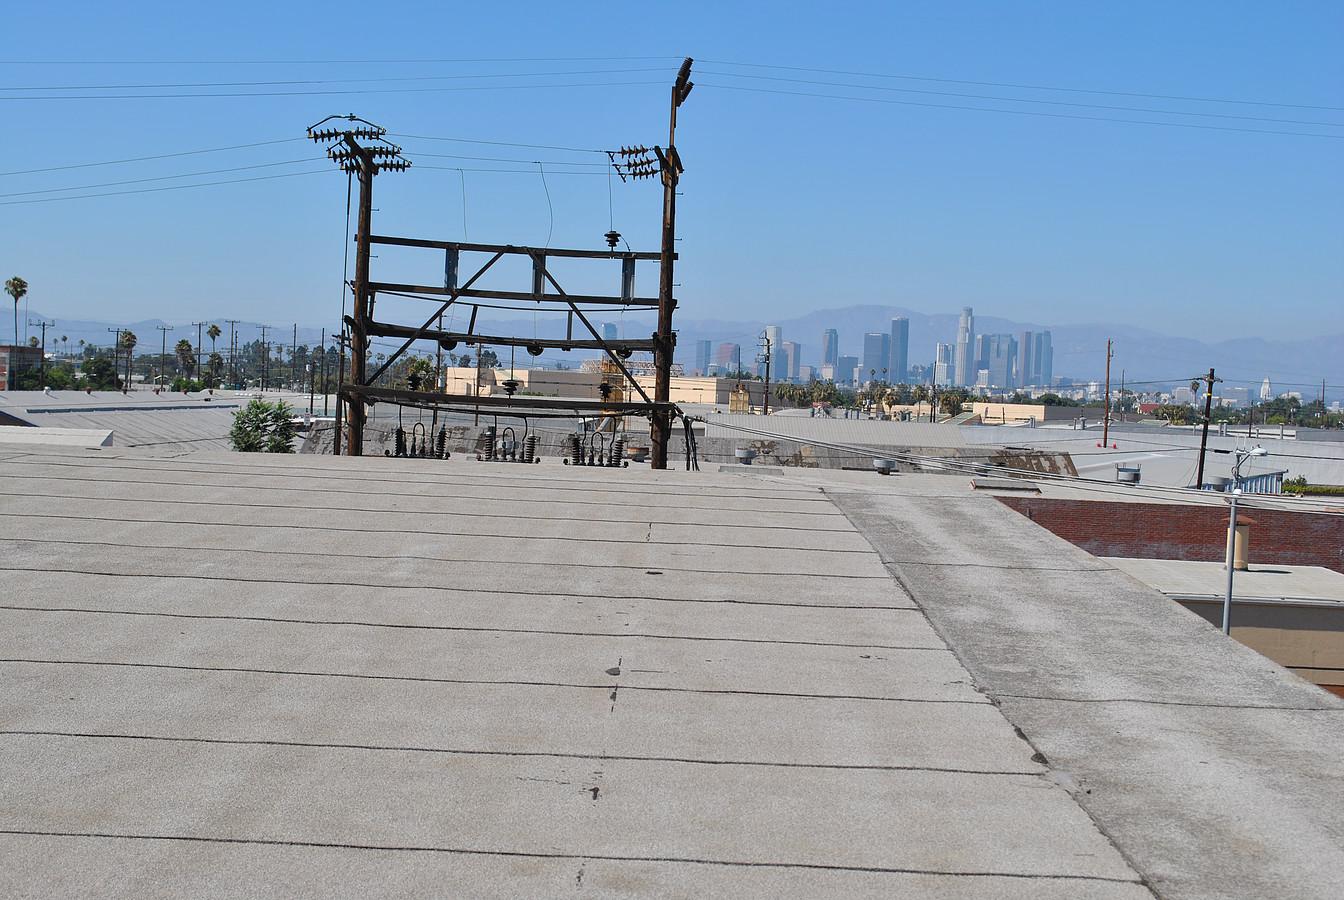 Studios 60 Rooftop Stage